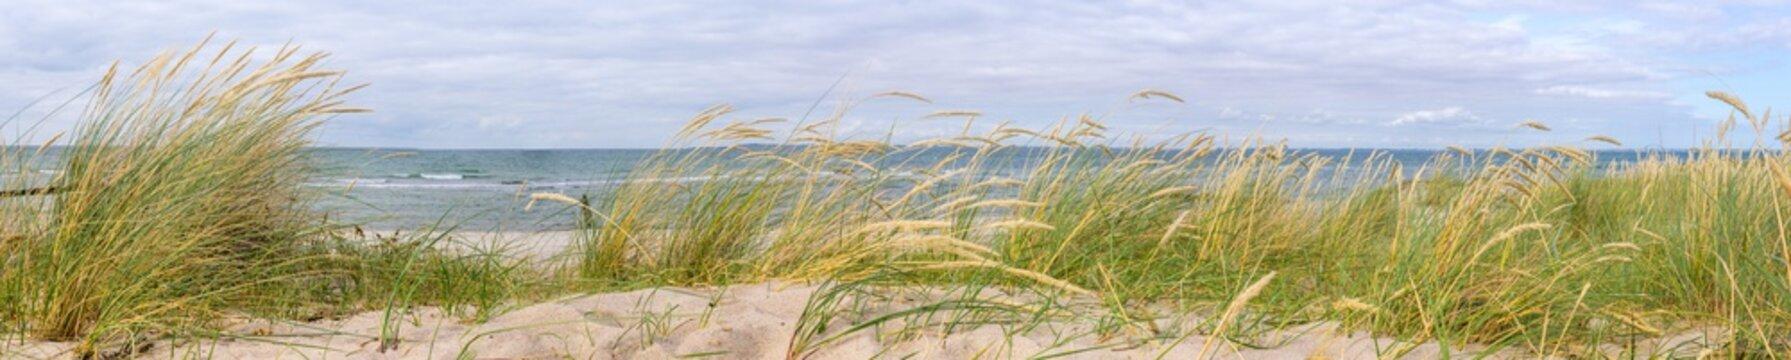 Panorama in den Dünen, Ostsee